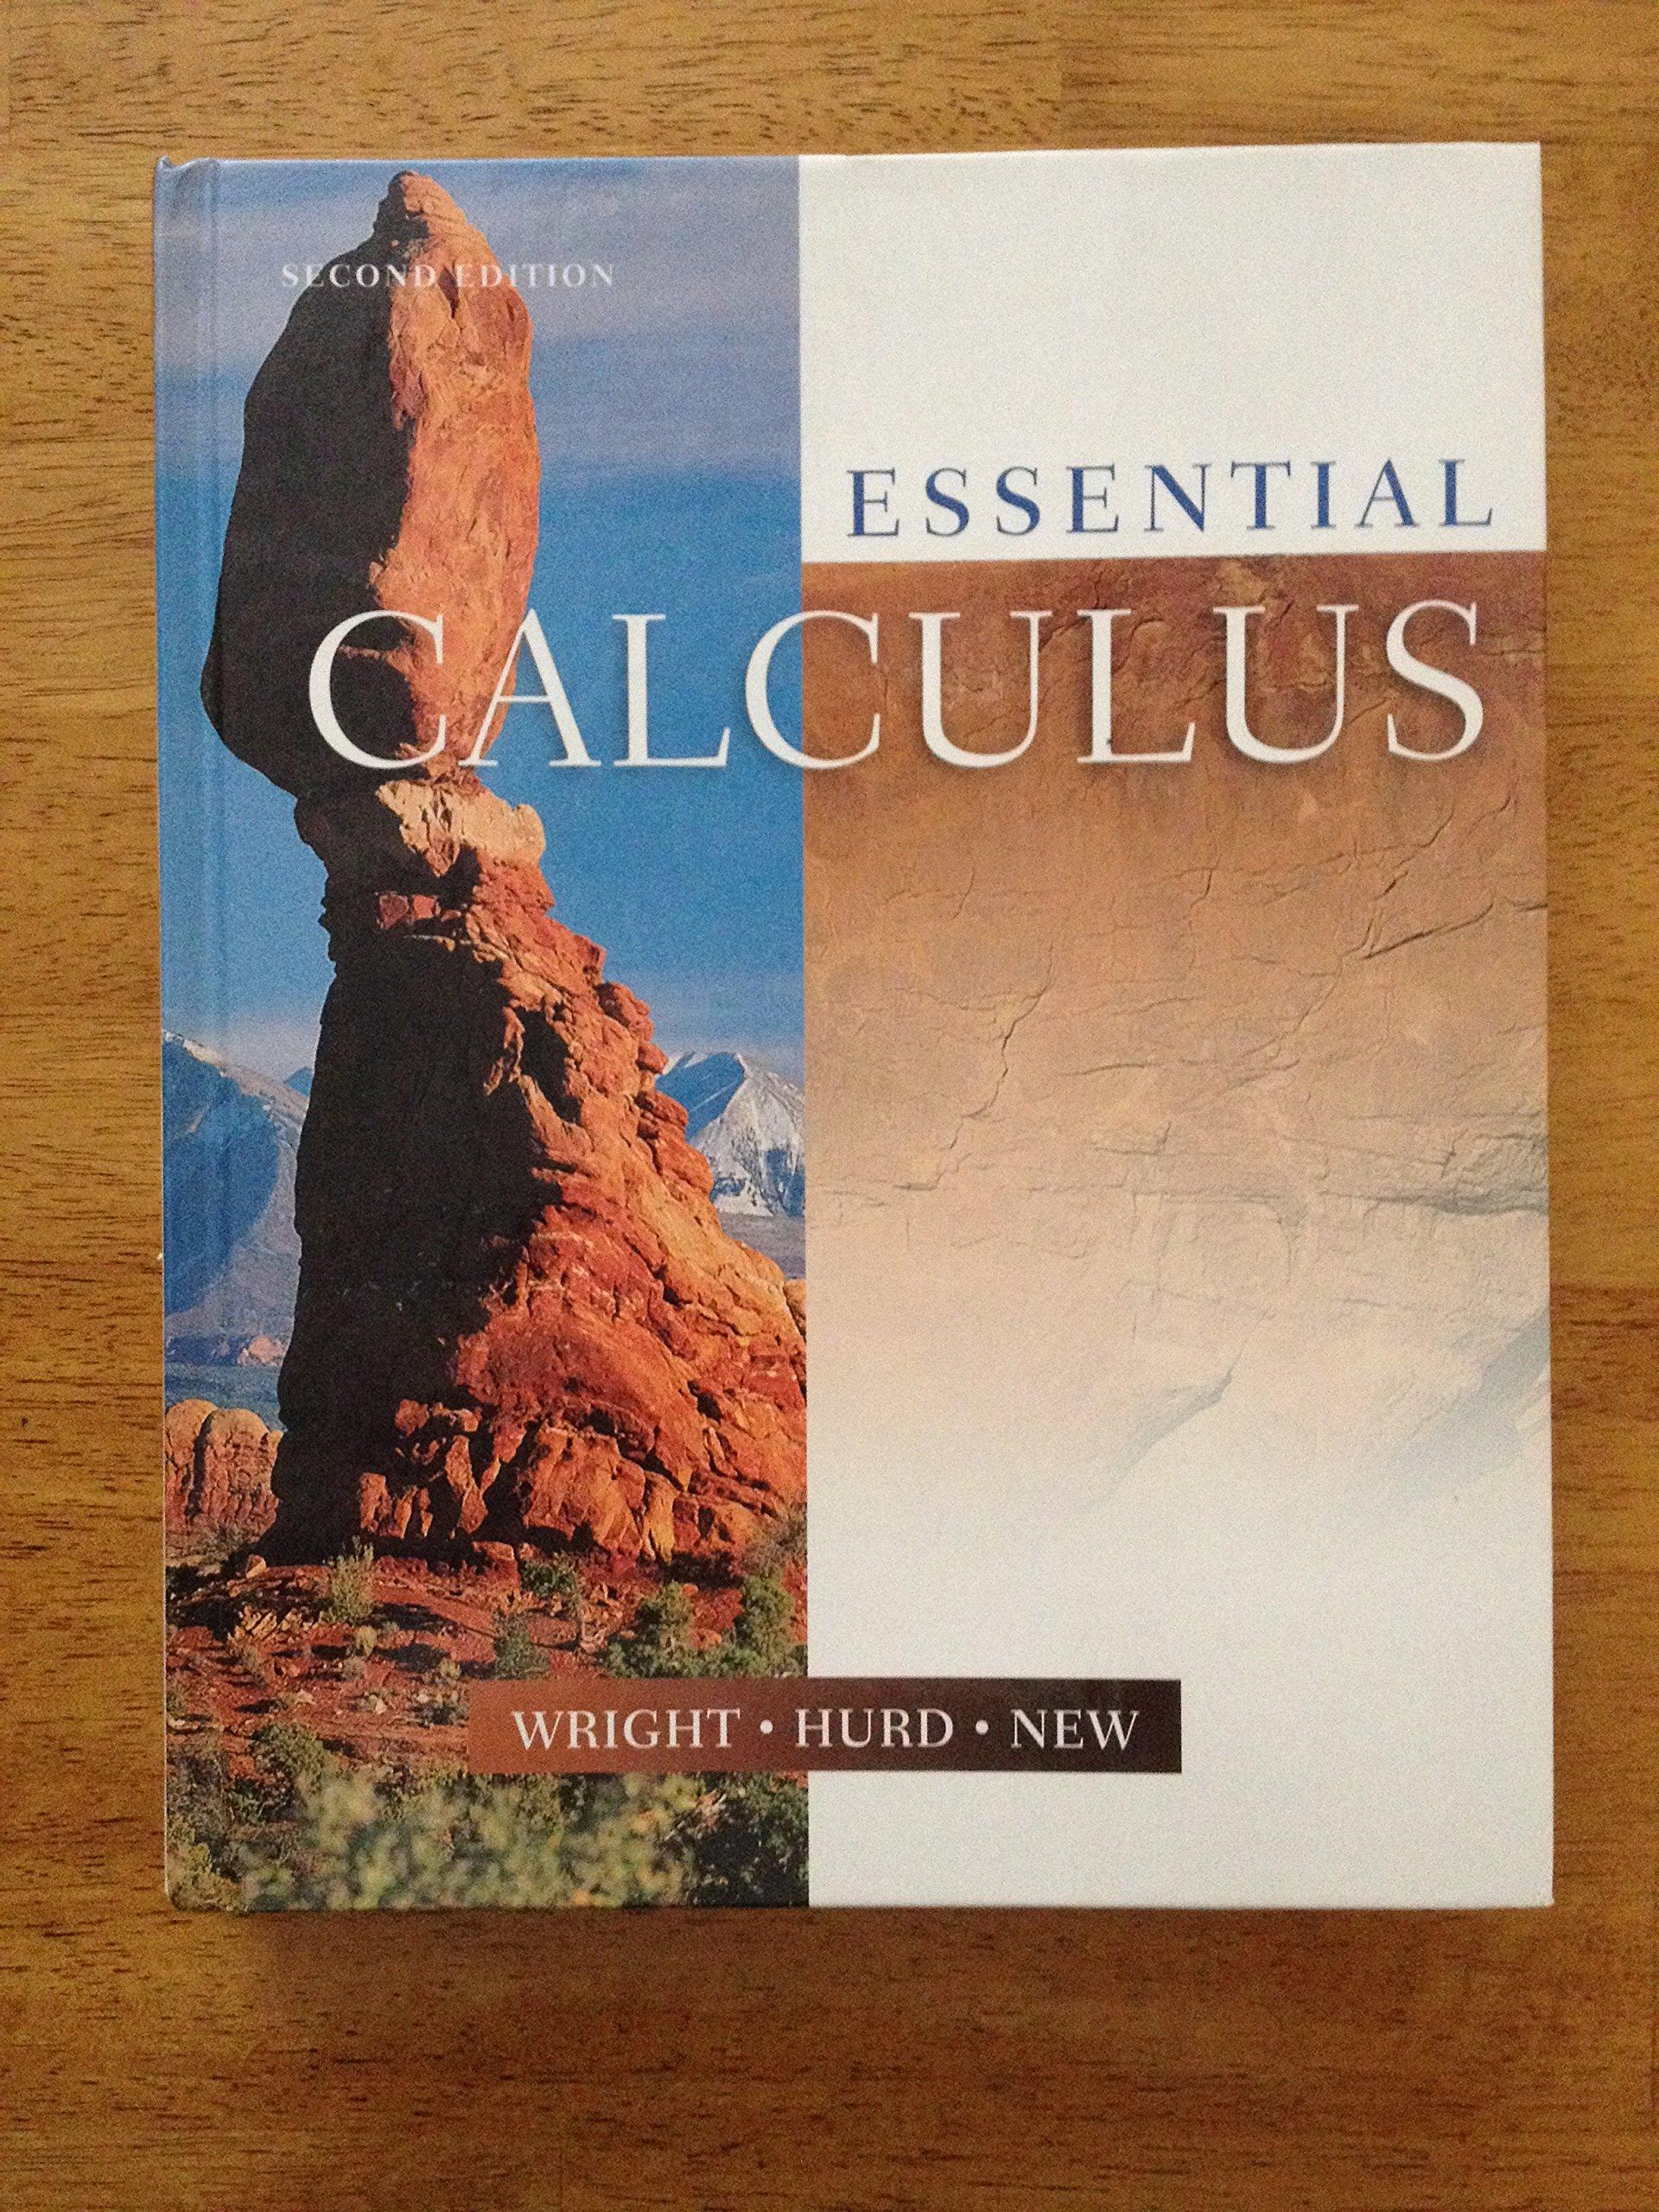 Essential Calculus Text: Wright; Hurd; New: 9780918091956: Amazon.com: Books